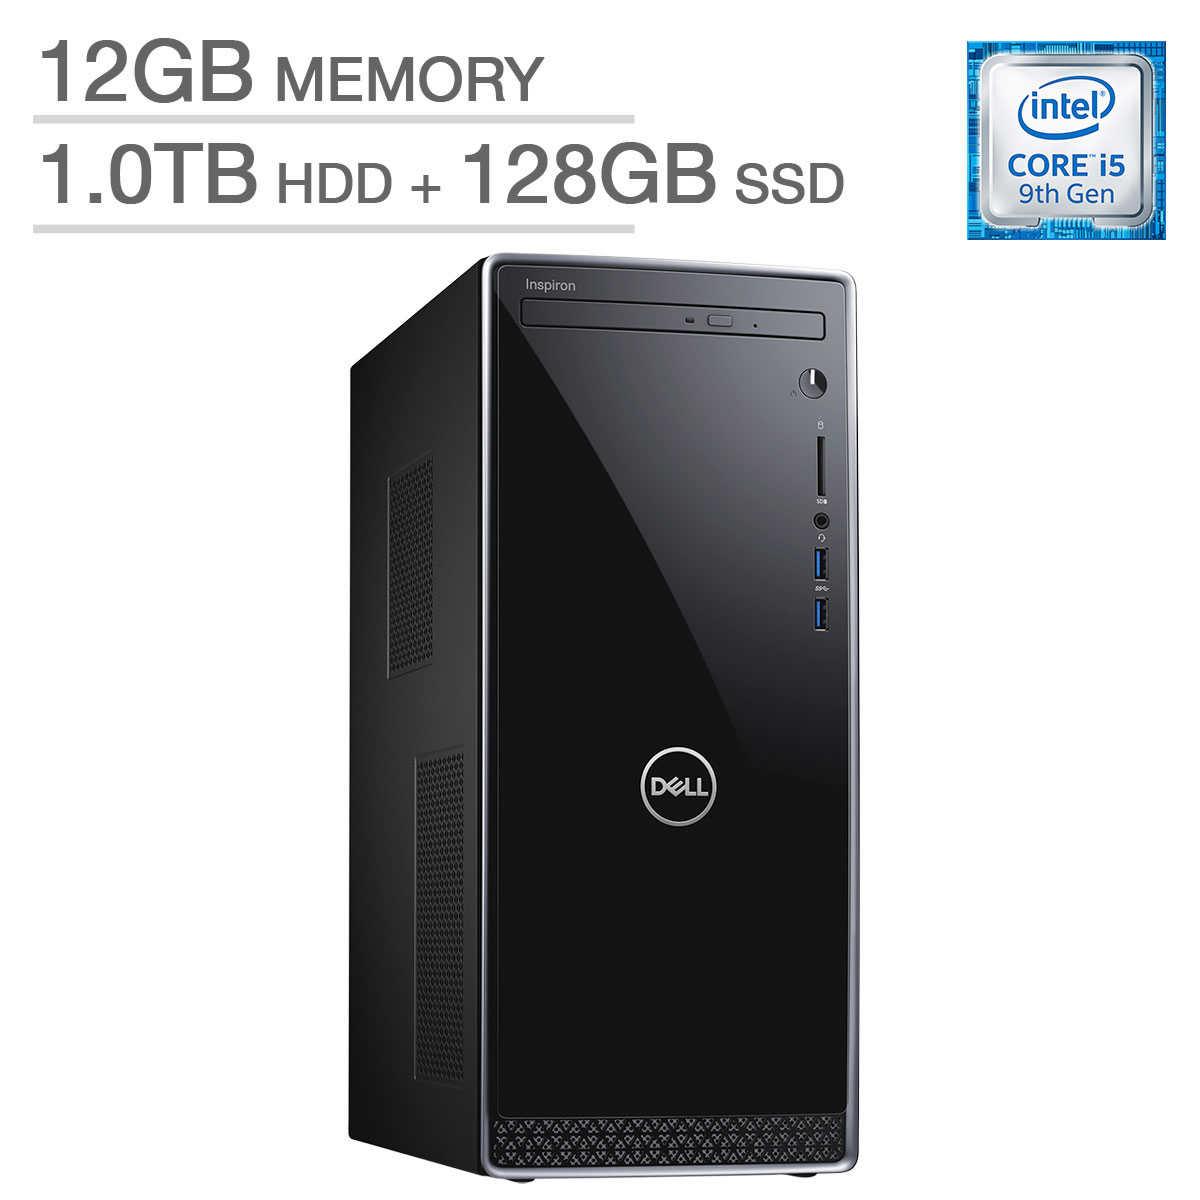 Dell Inspiron Desktop at Costco - Intel Core i5, 12GB RAM, 1TB HDD, 128GB SSD - $599.99